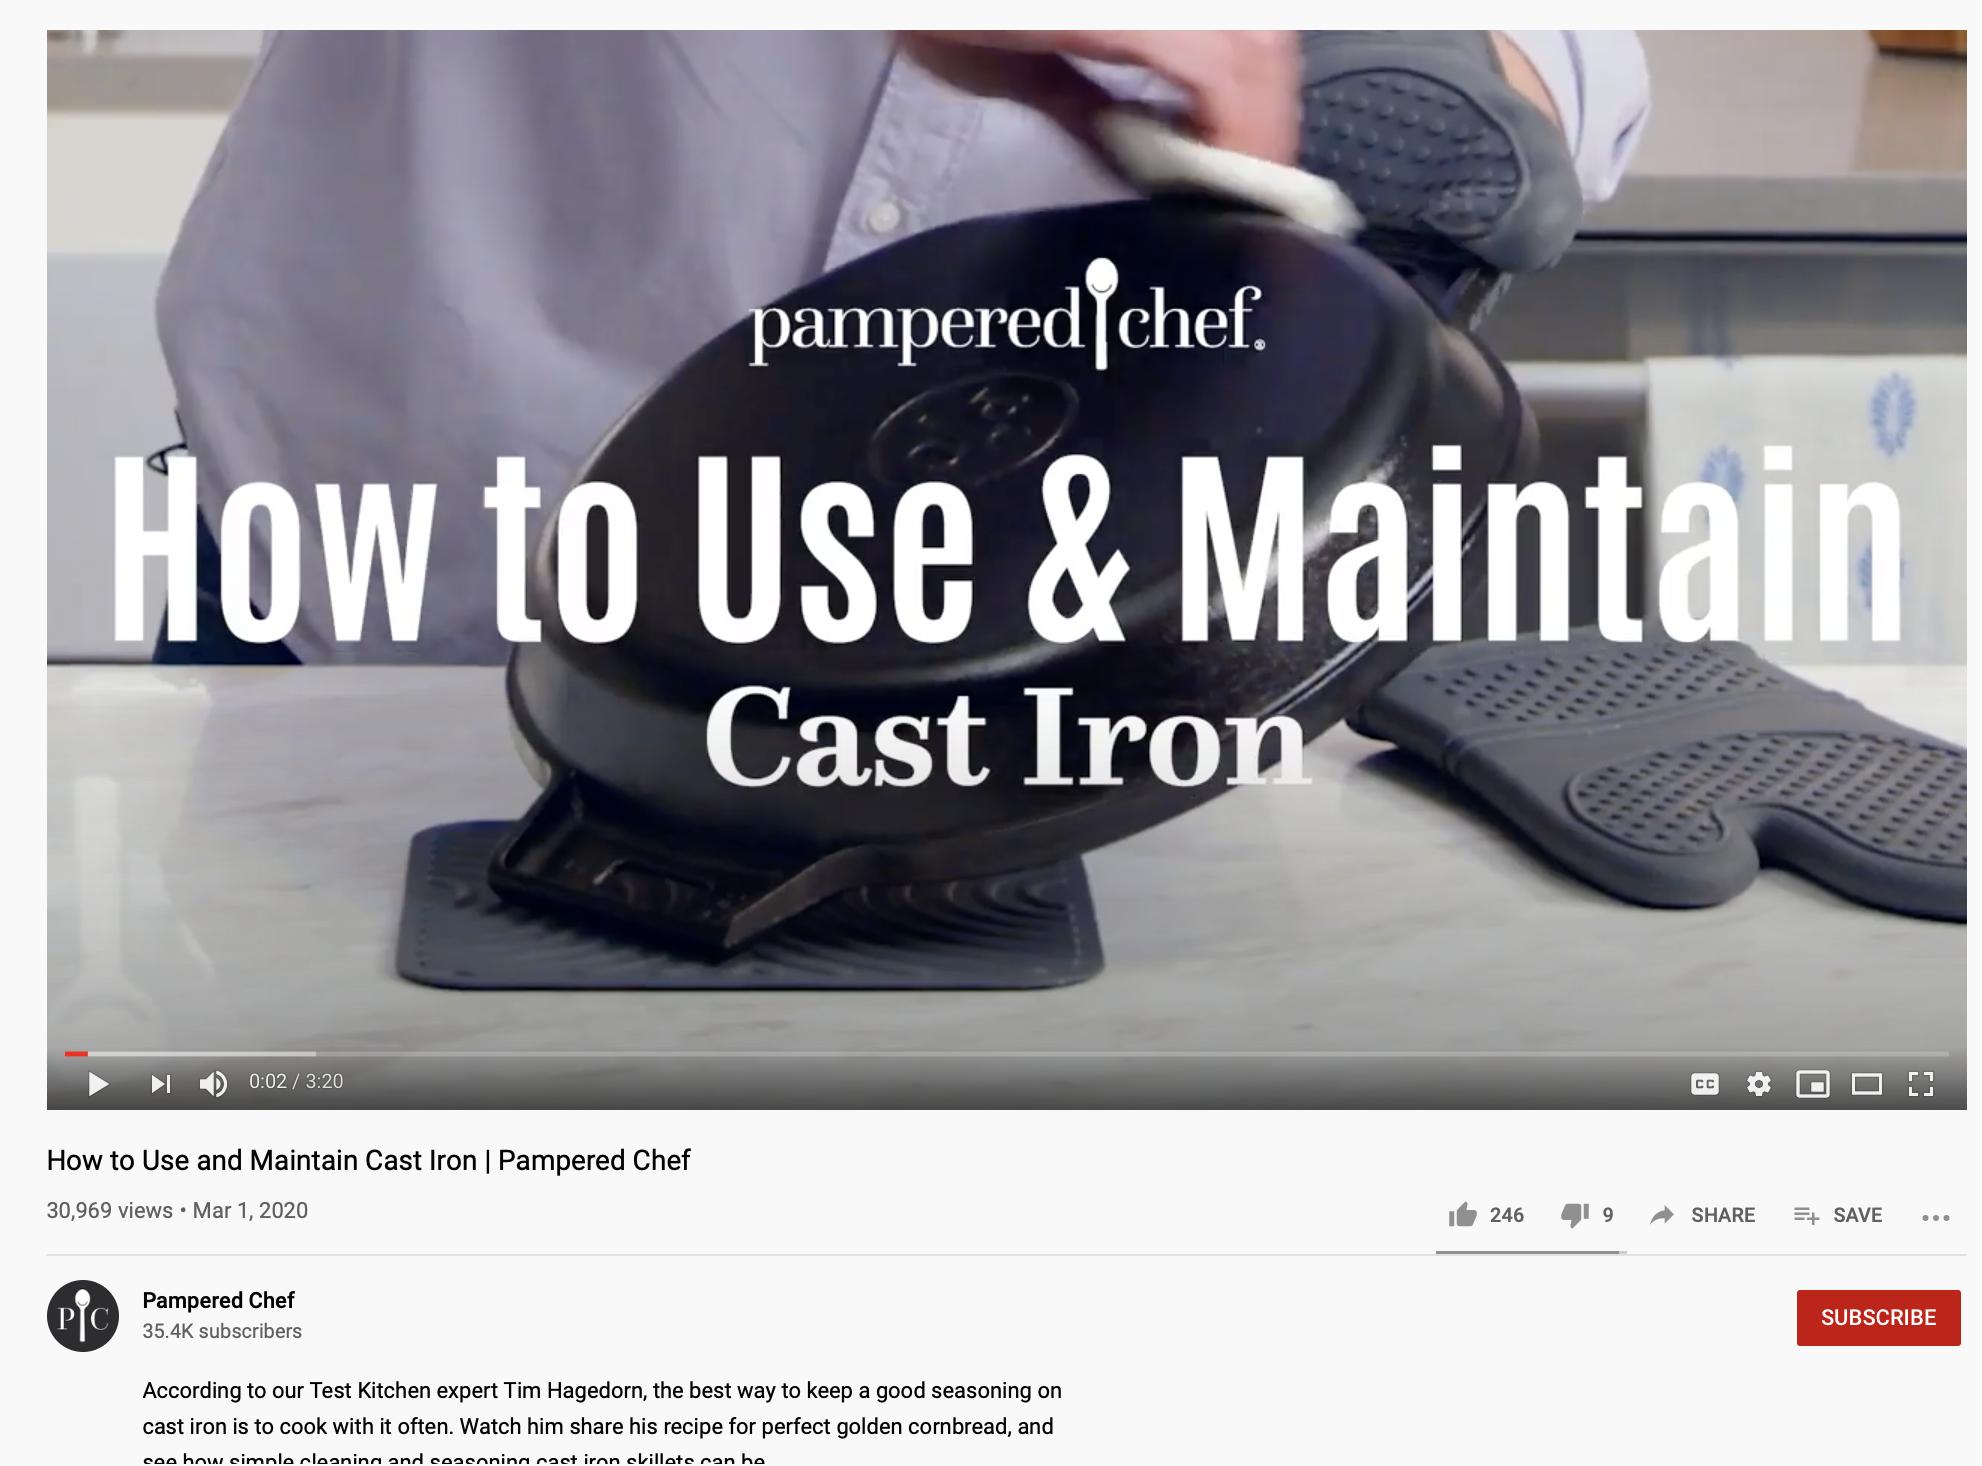 Care-focused YouTube video ideas